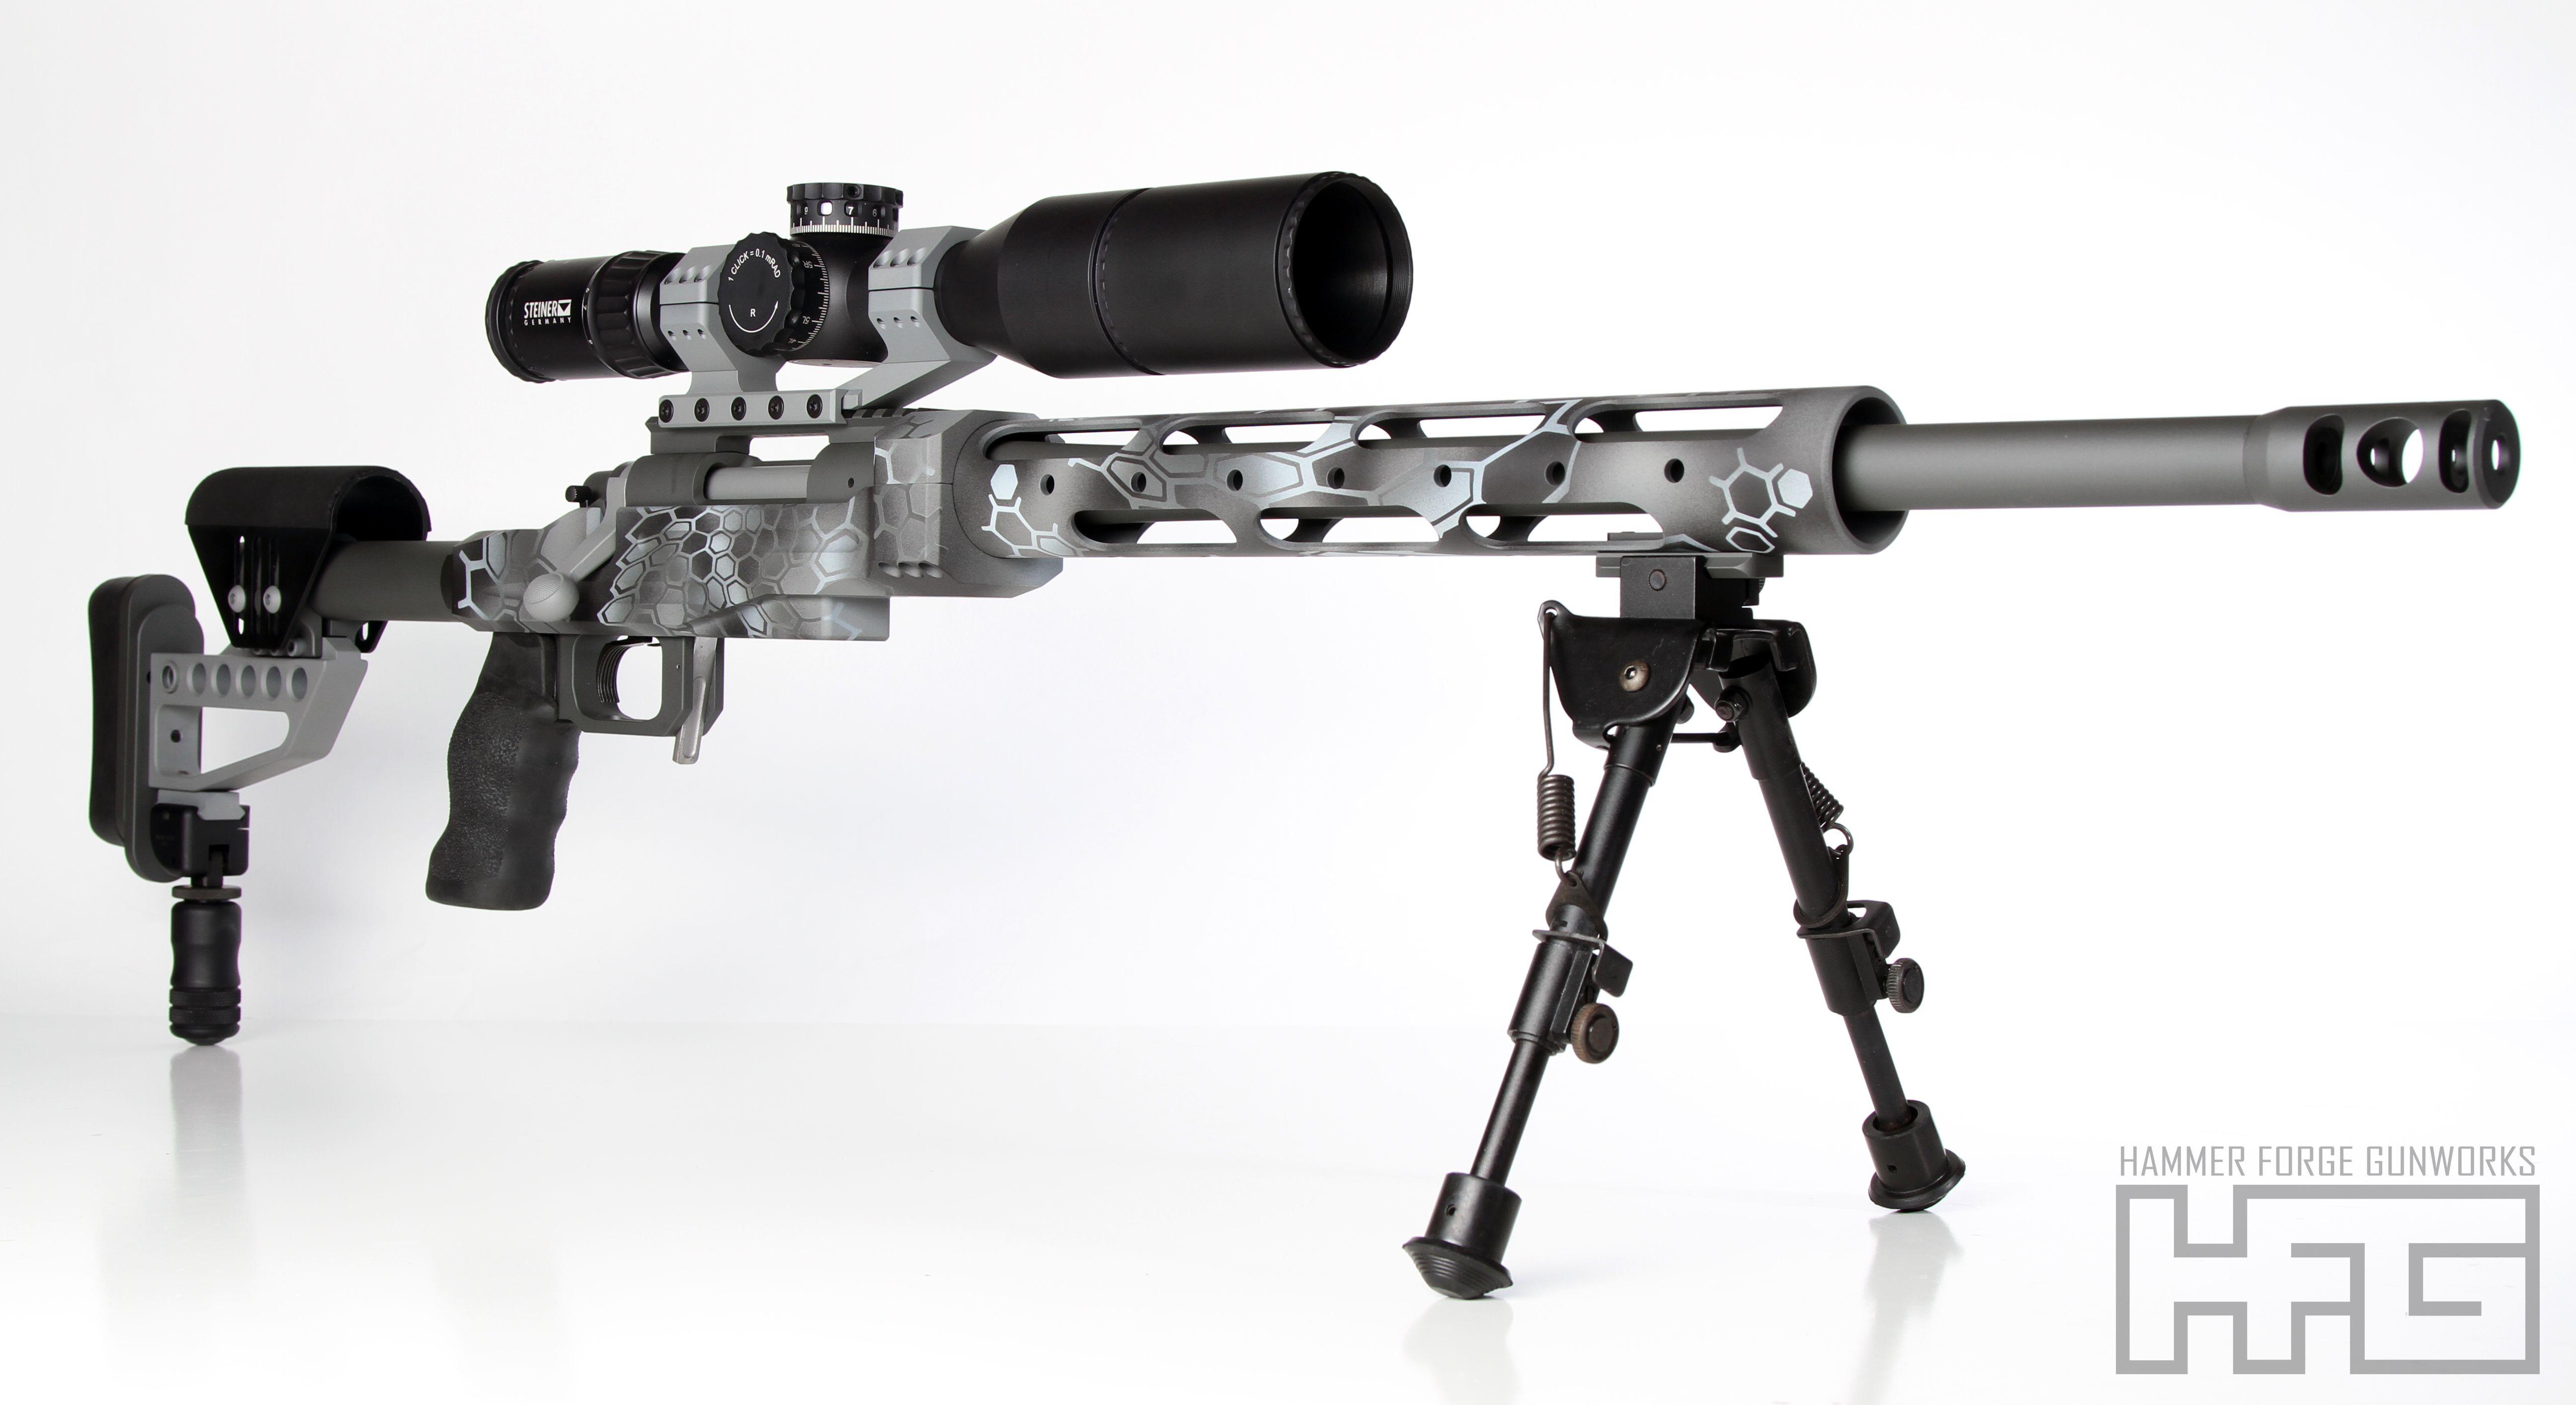 Pin on Rifles